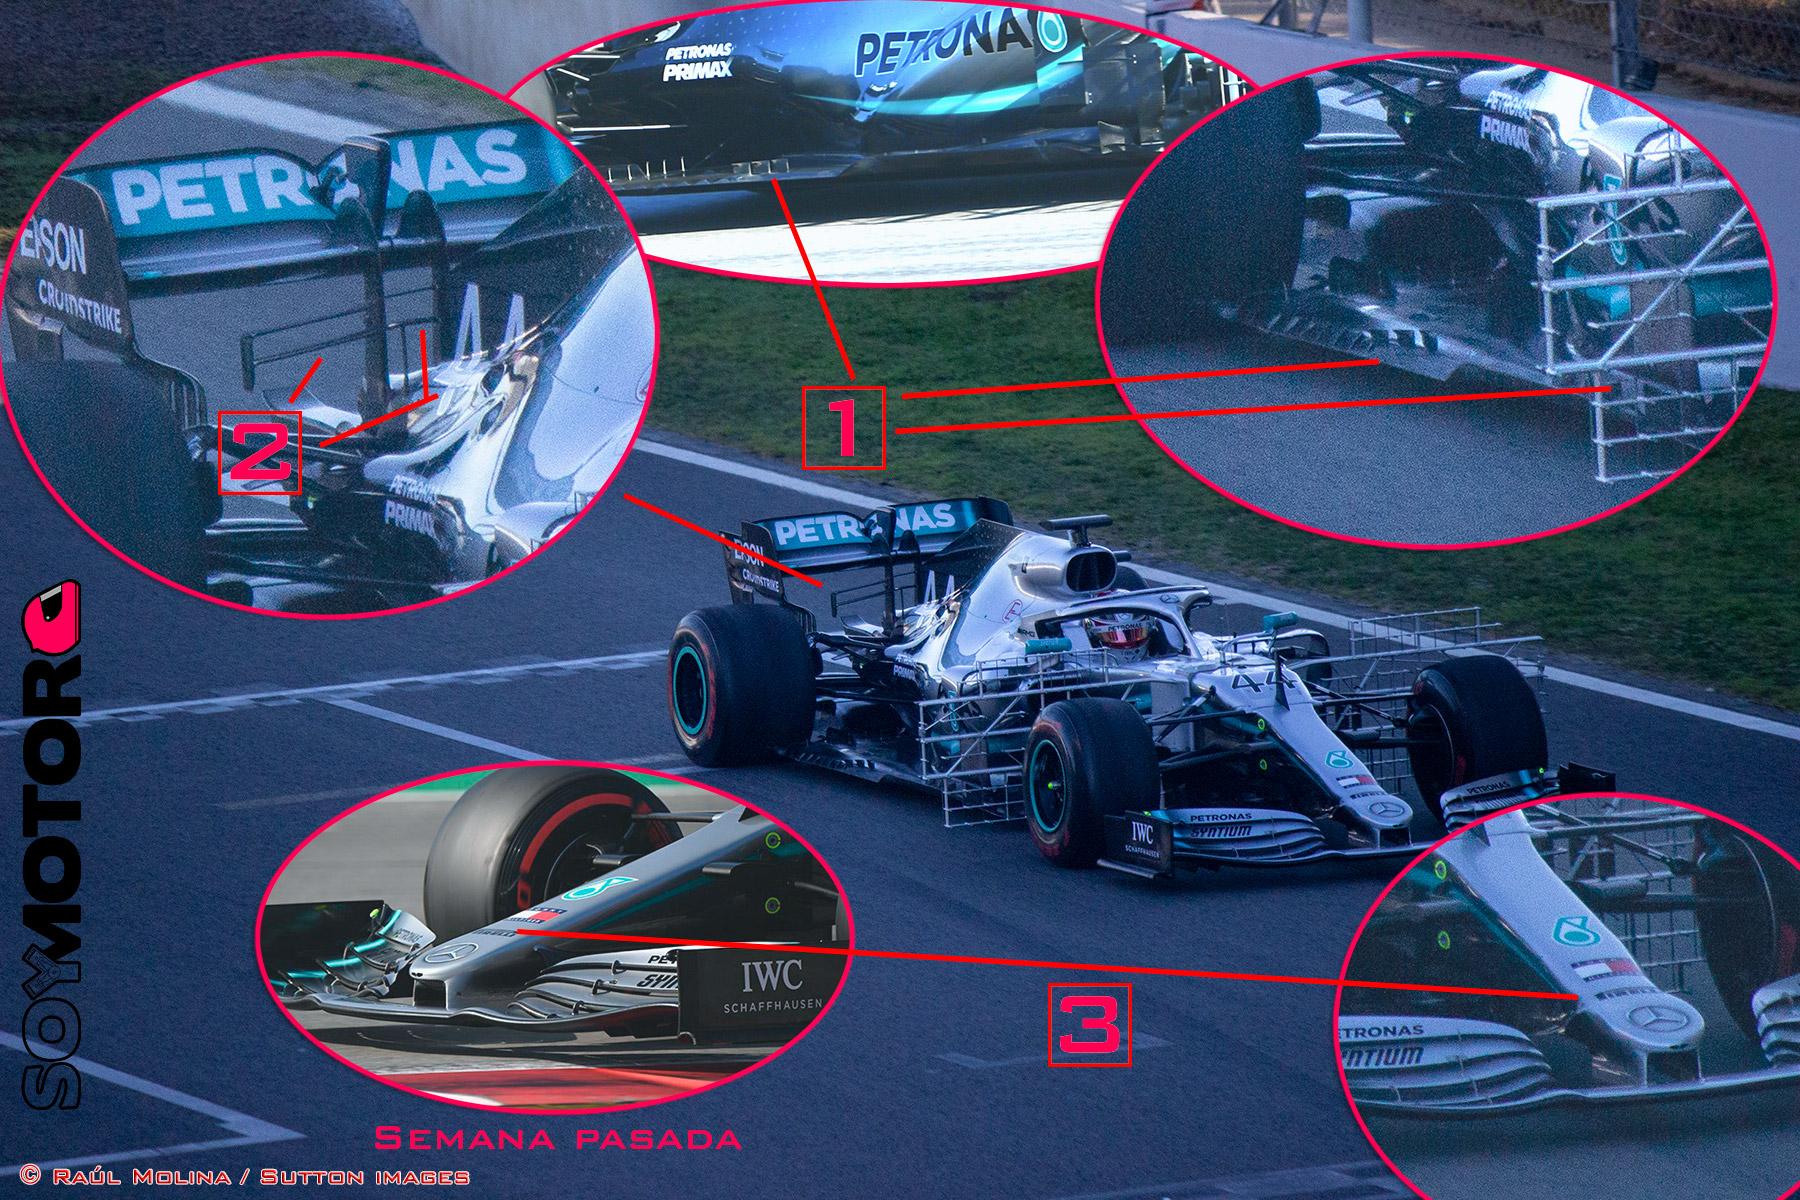 mercedes-nuevo-kit-aerodinamico-soymotor.jpg